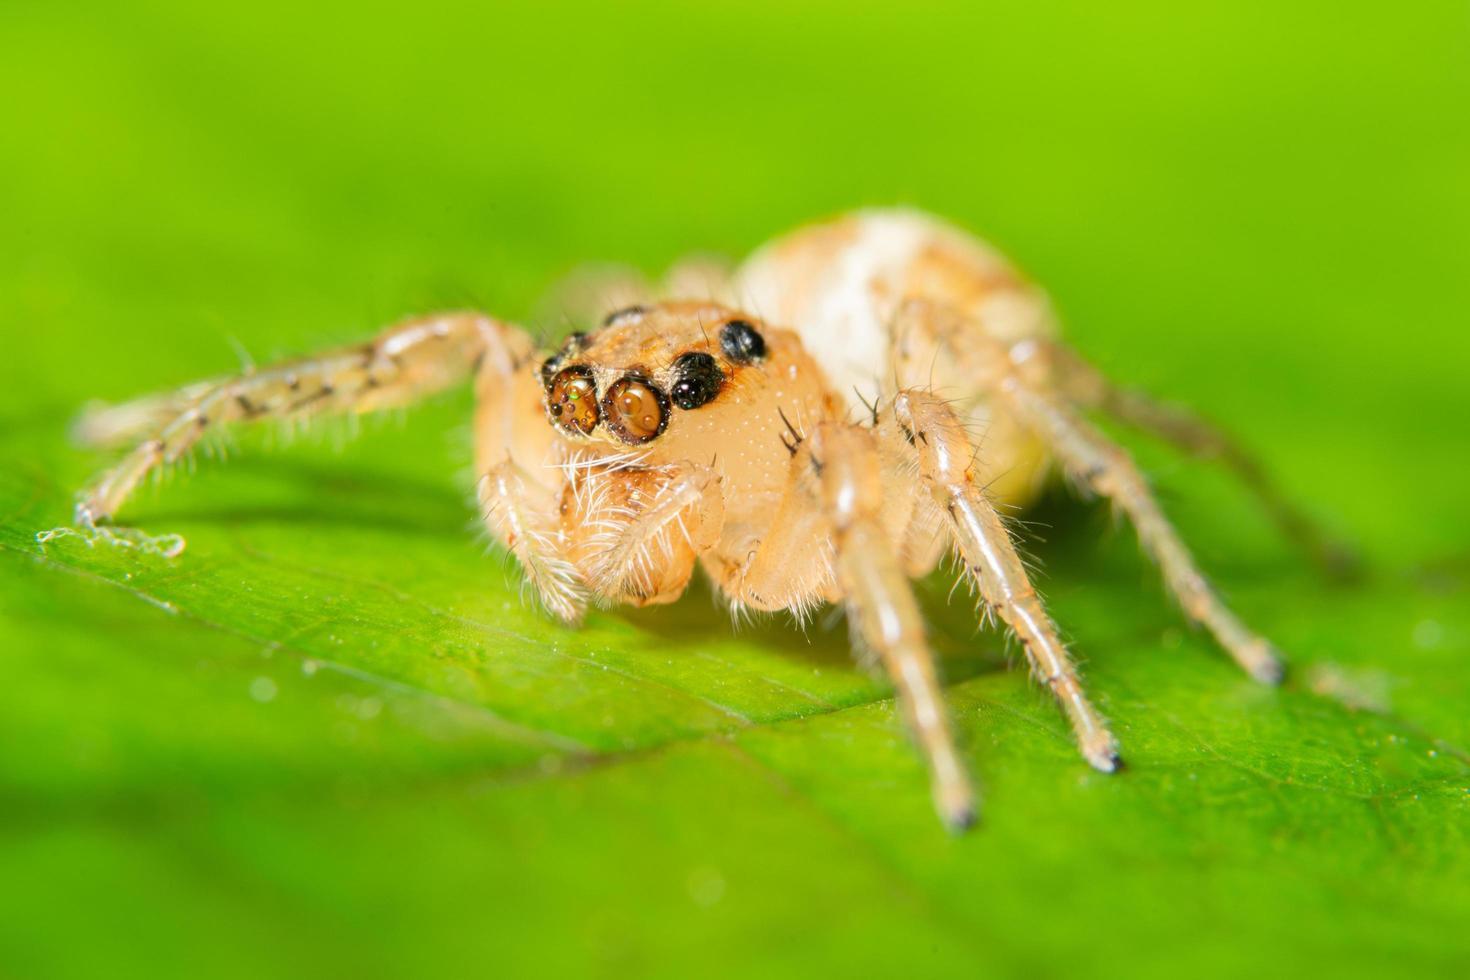 Spider on a green leaf photo